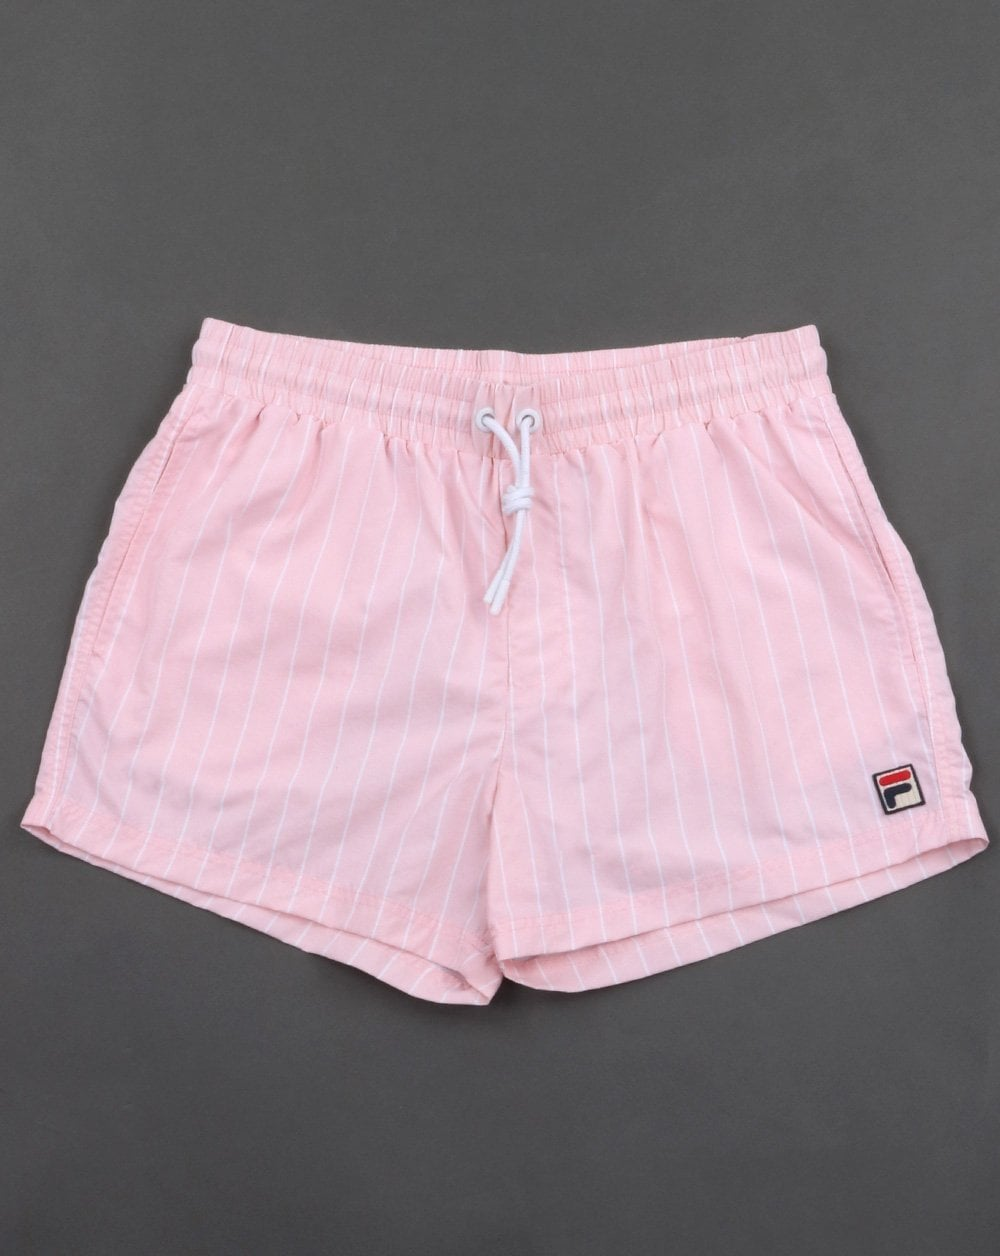 c5d06d284676 Fila Vintage Pinstripe Swim Shorts Pink | 80s casual classics